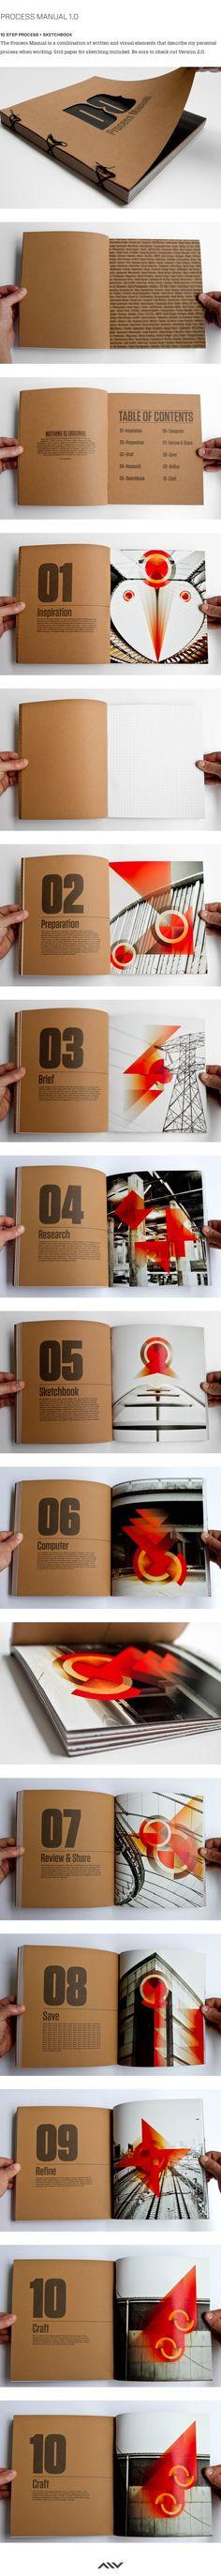 Process Manual Volume 1.0 on Behance